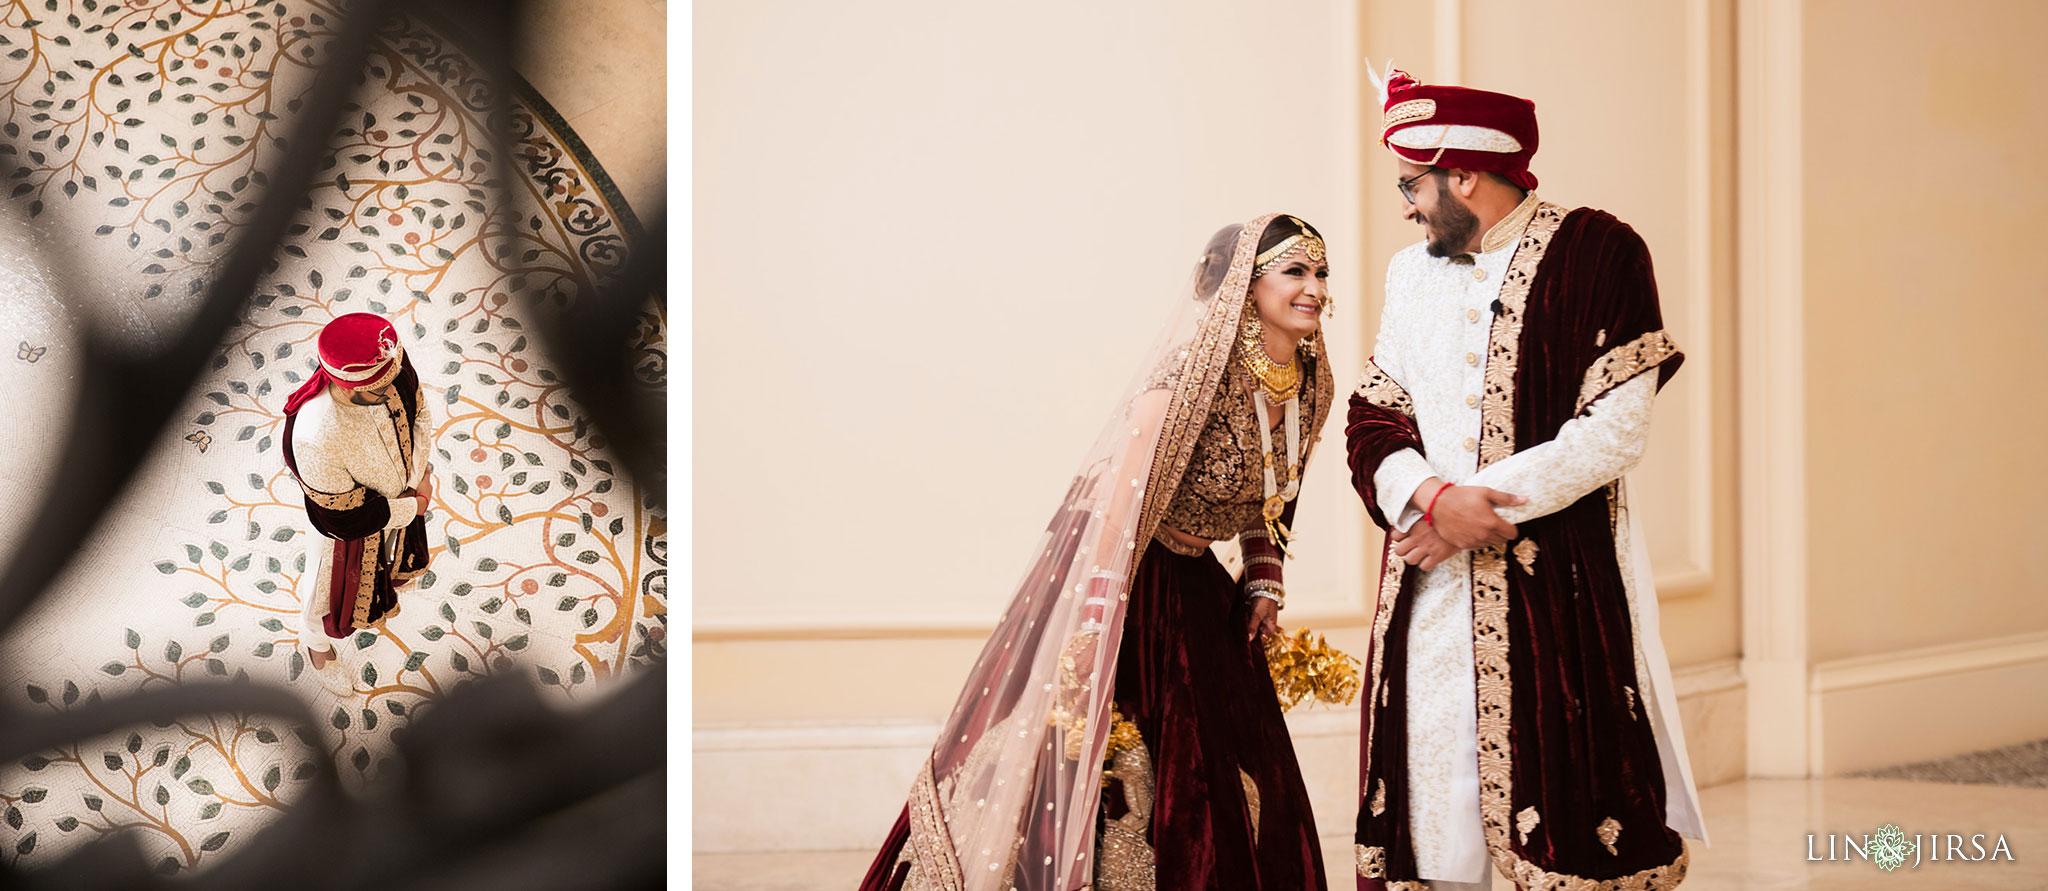 009 monarch beach resort dana point indian wedding photography